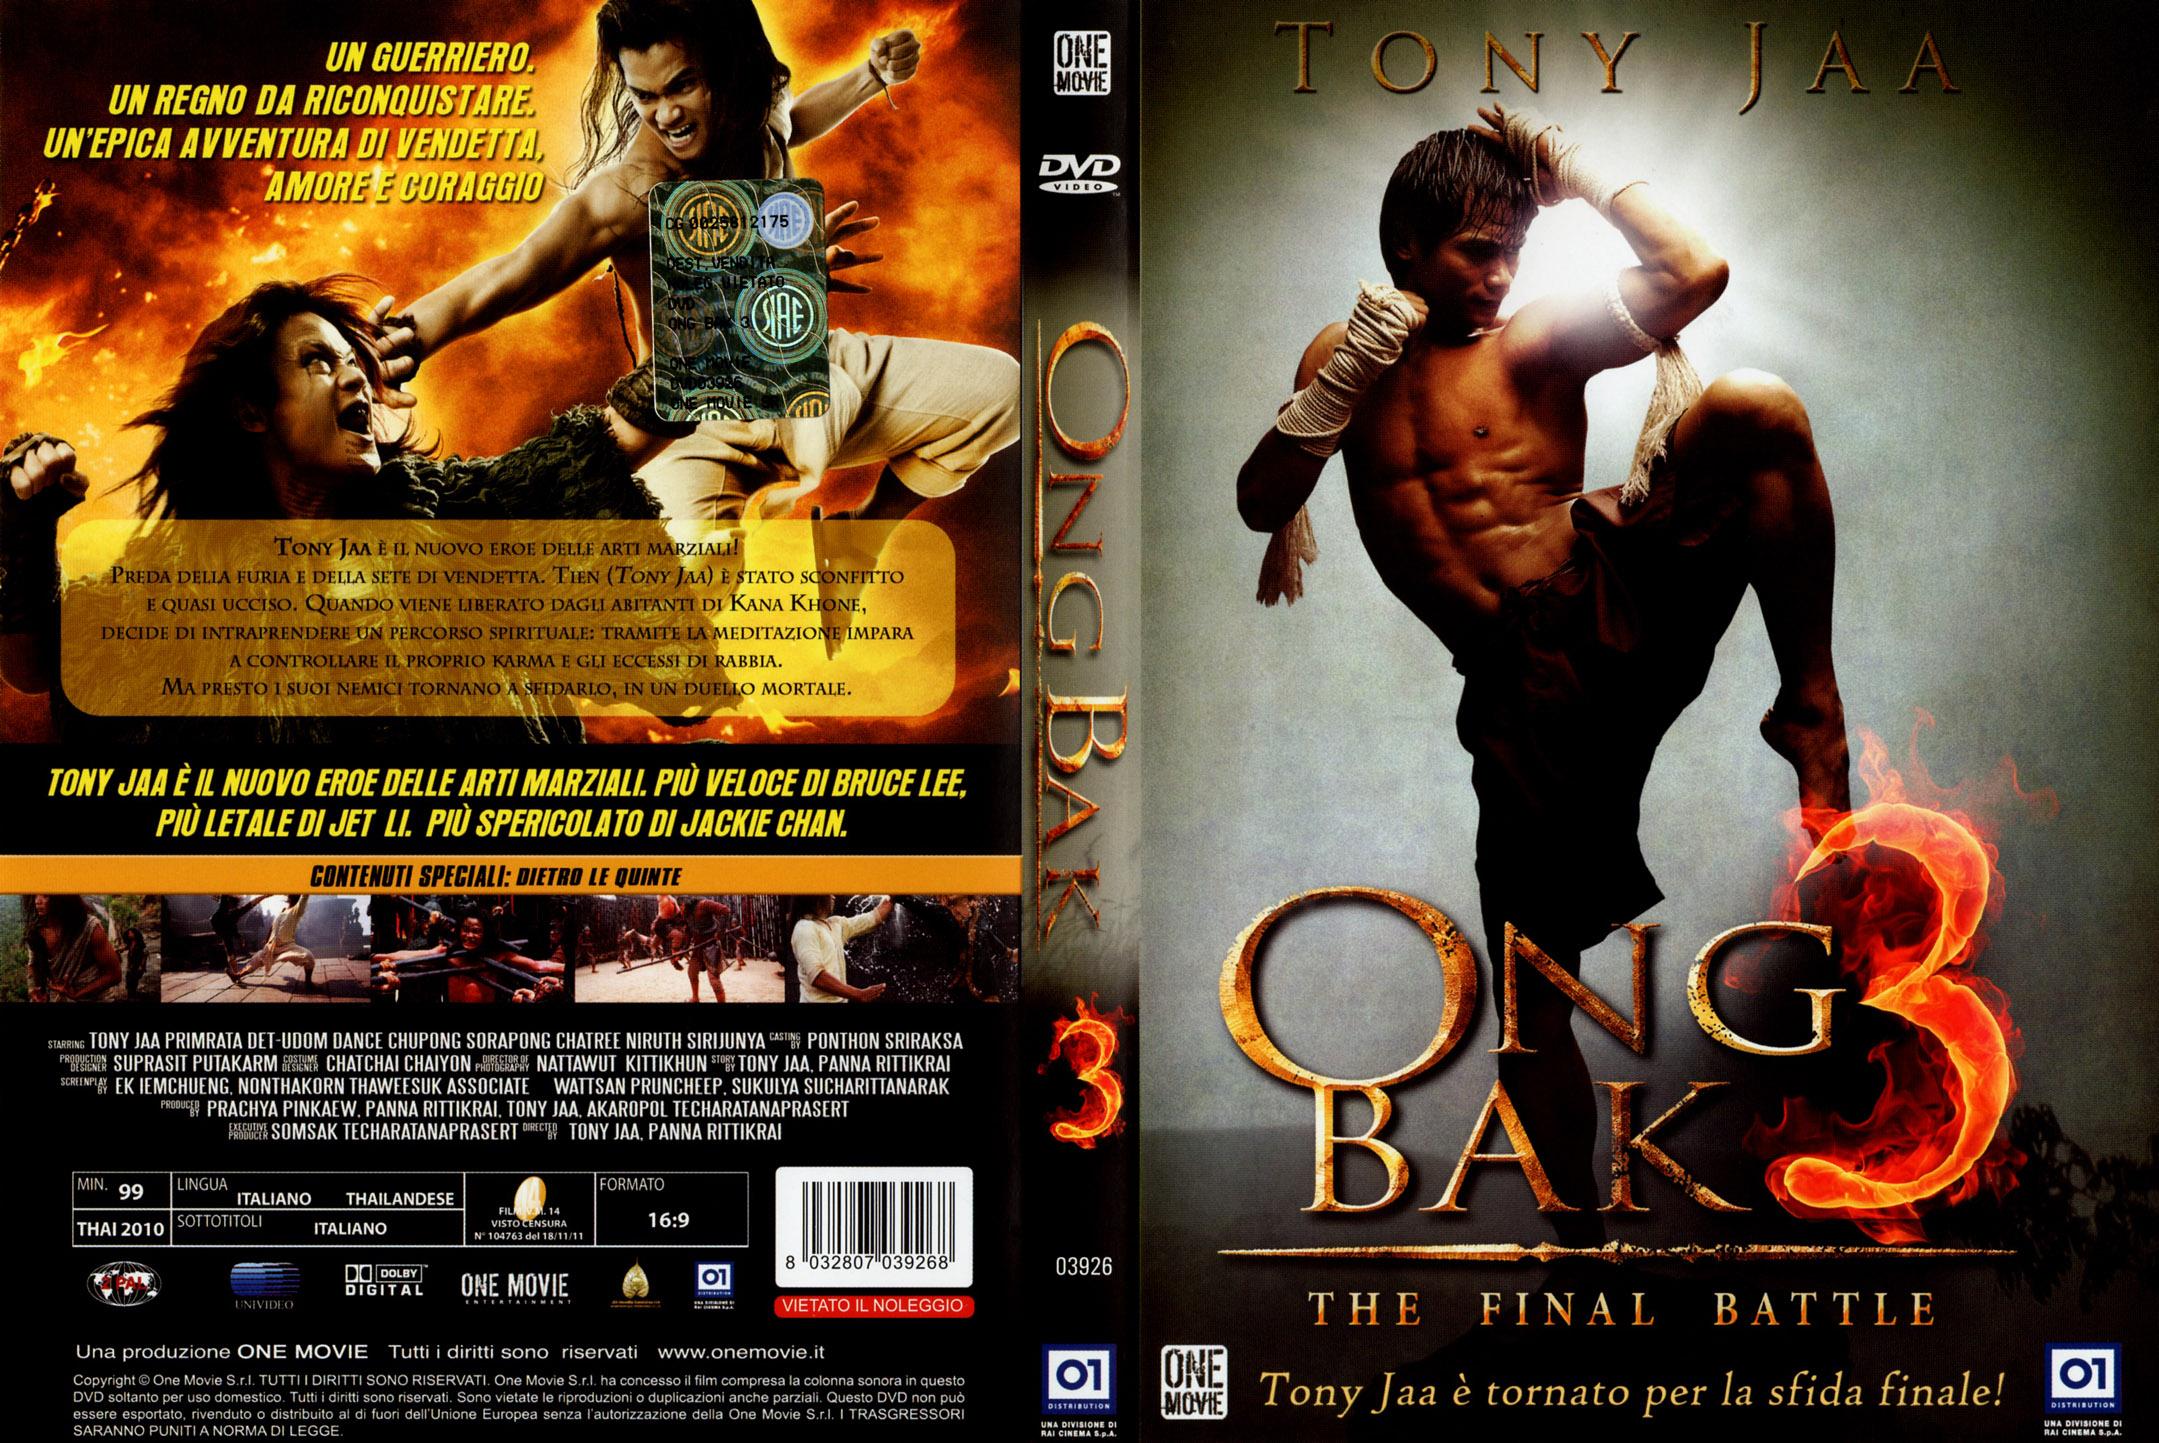 Ong-Bak 3 Backgrounds on Wallpapers Vista